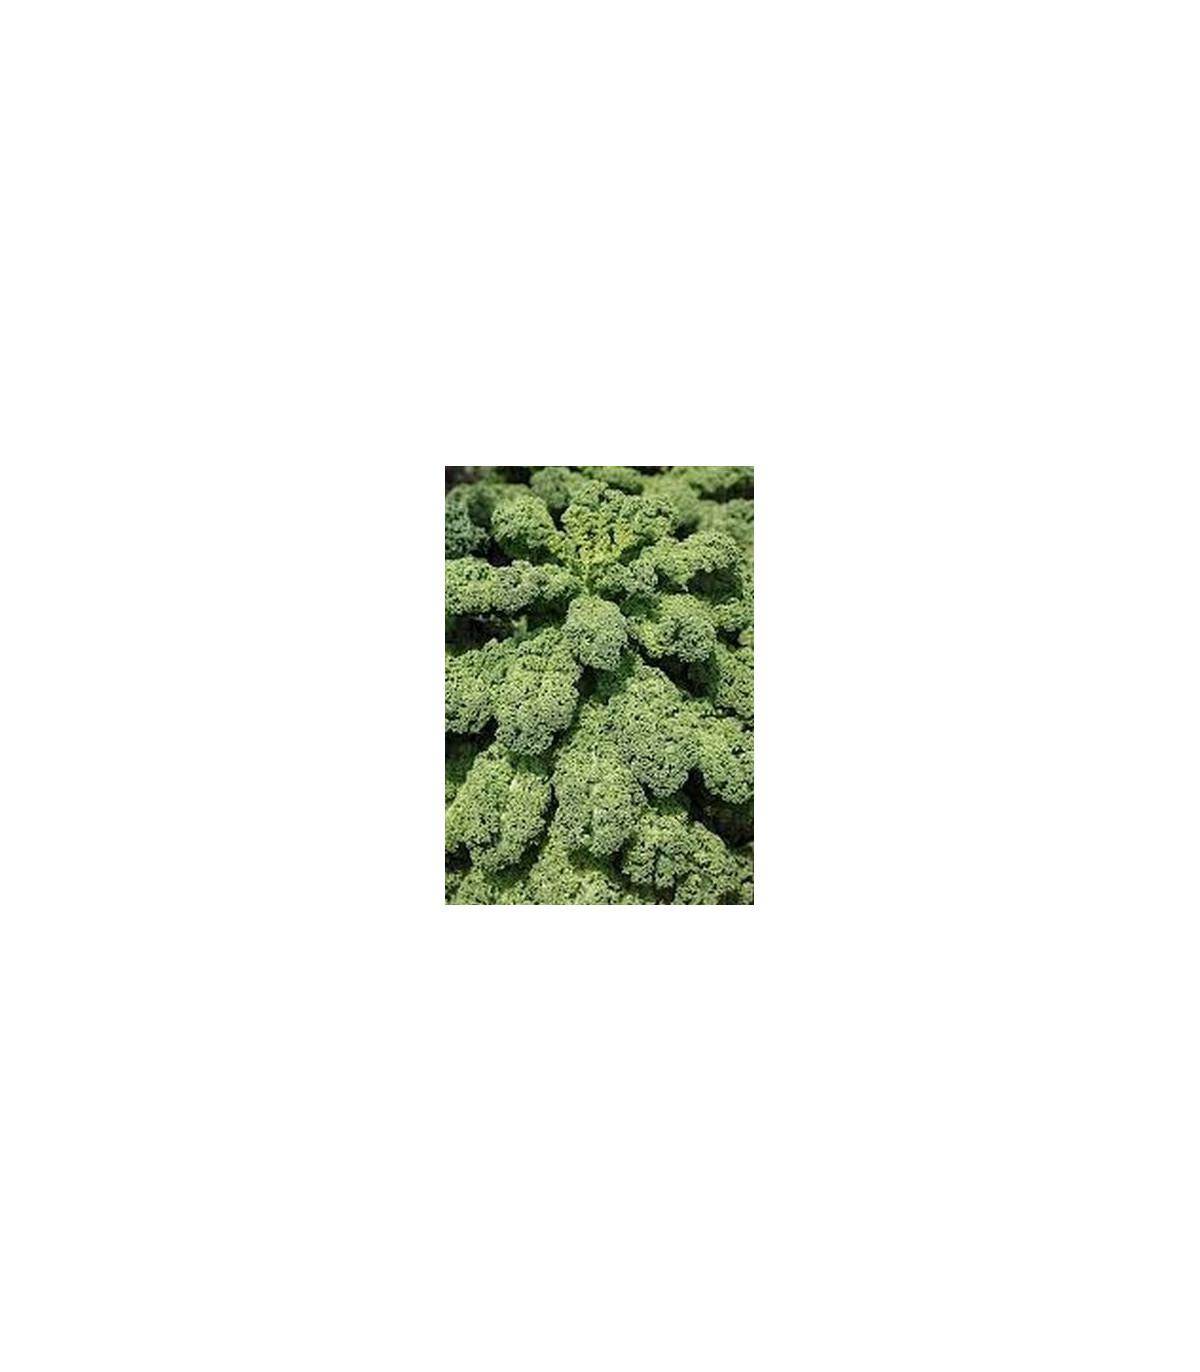 Kučeravý kel zelený stredne vysoký - semená Kelu - 0,9 gr